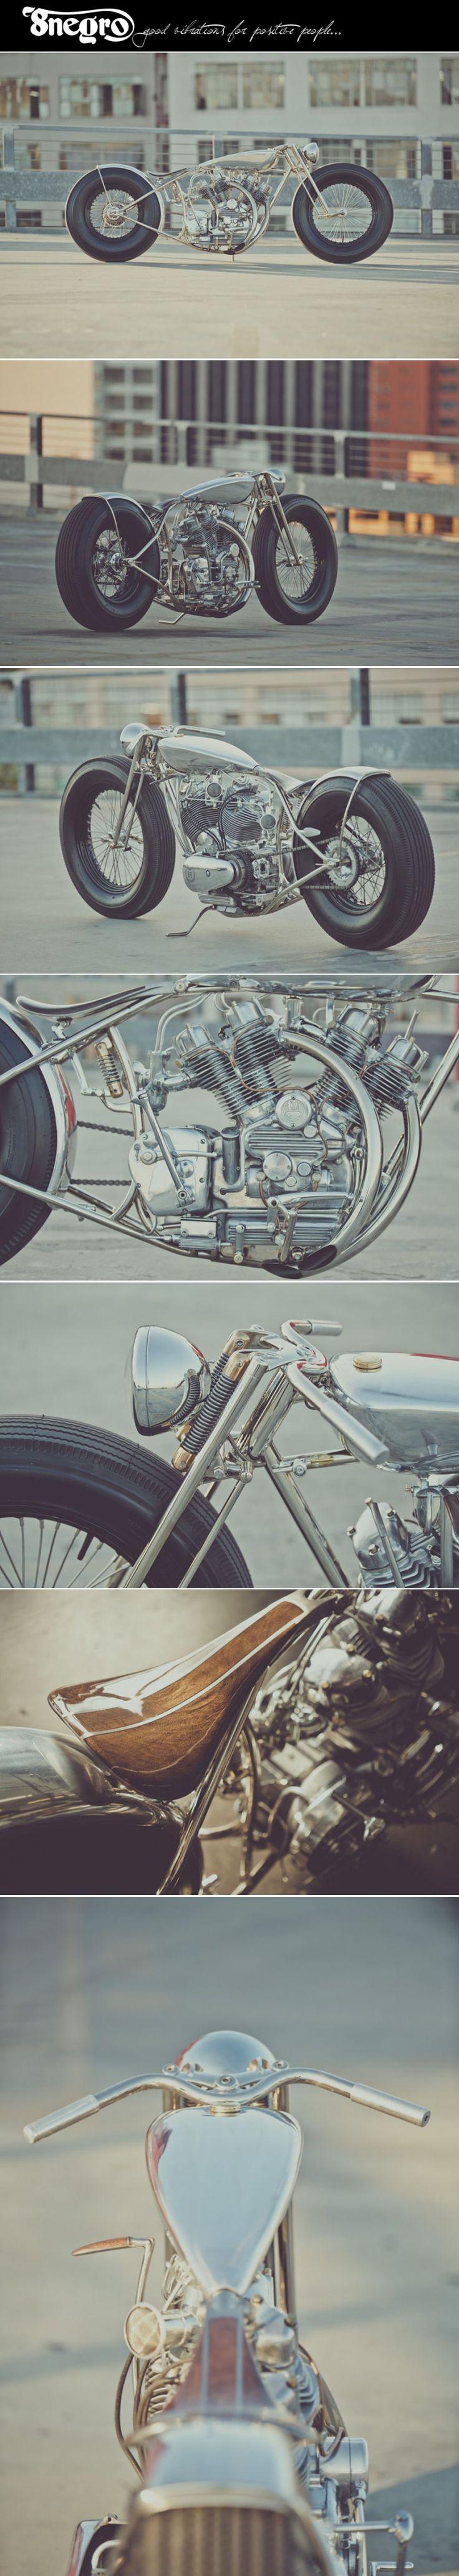 'The Musket' Royal Enfield V-twin:: Hazan Motorworks. 8negro